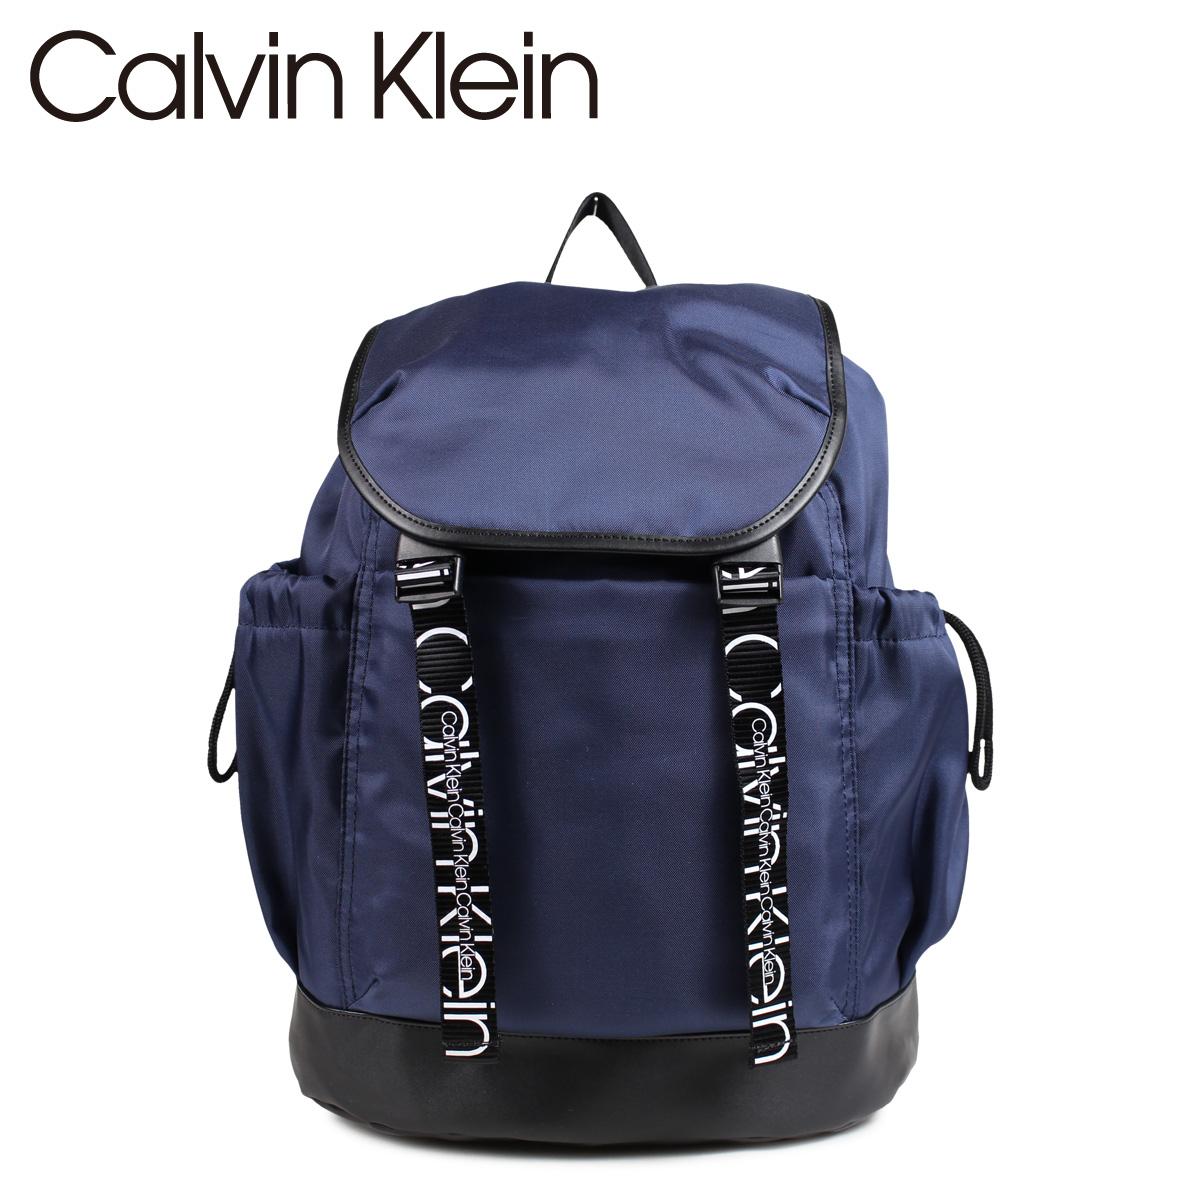 Calvin Klein G3 NYLON BACKPACK カルバンクライン リュック バッグ バックパック メンズ レディース ネイビー CKSTR H8GKE8QW